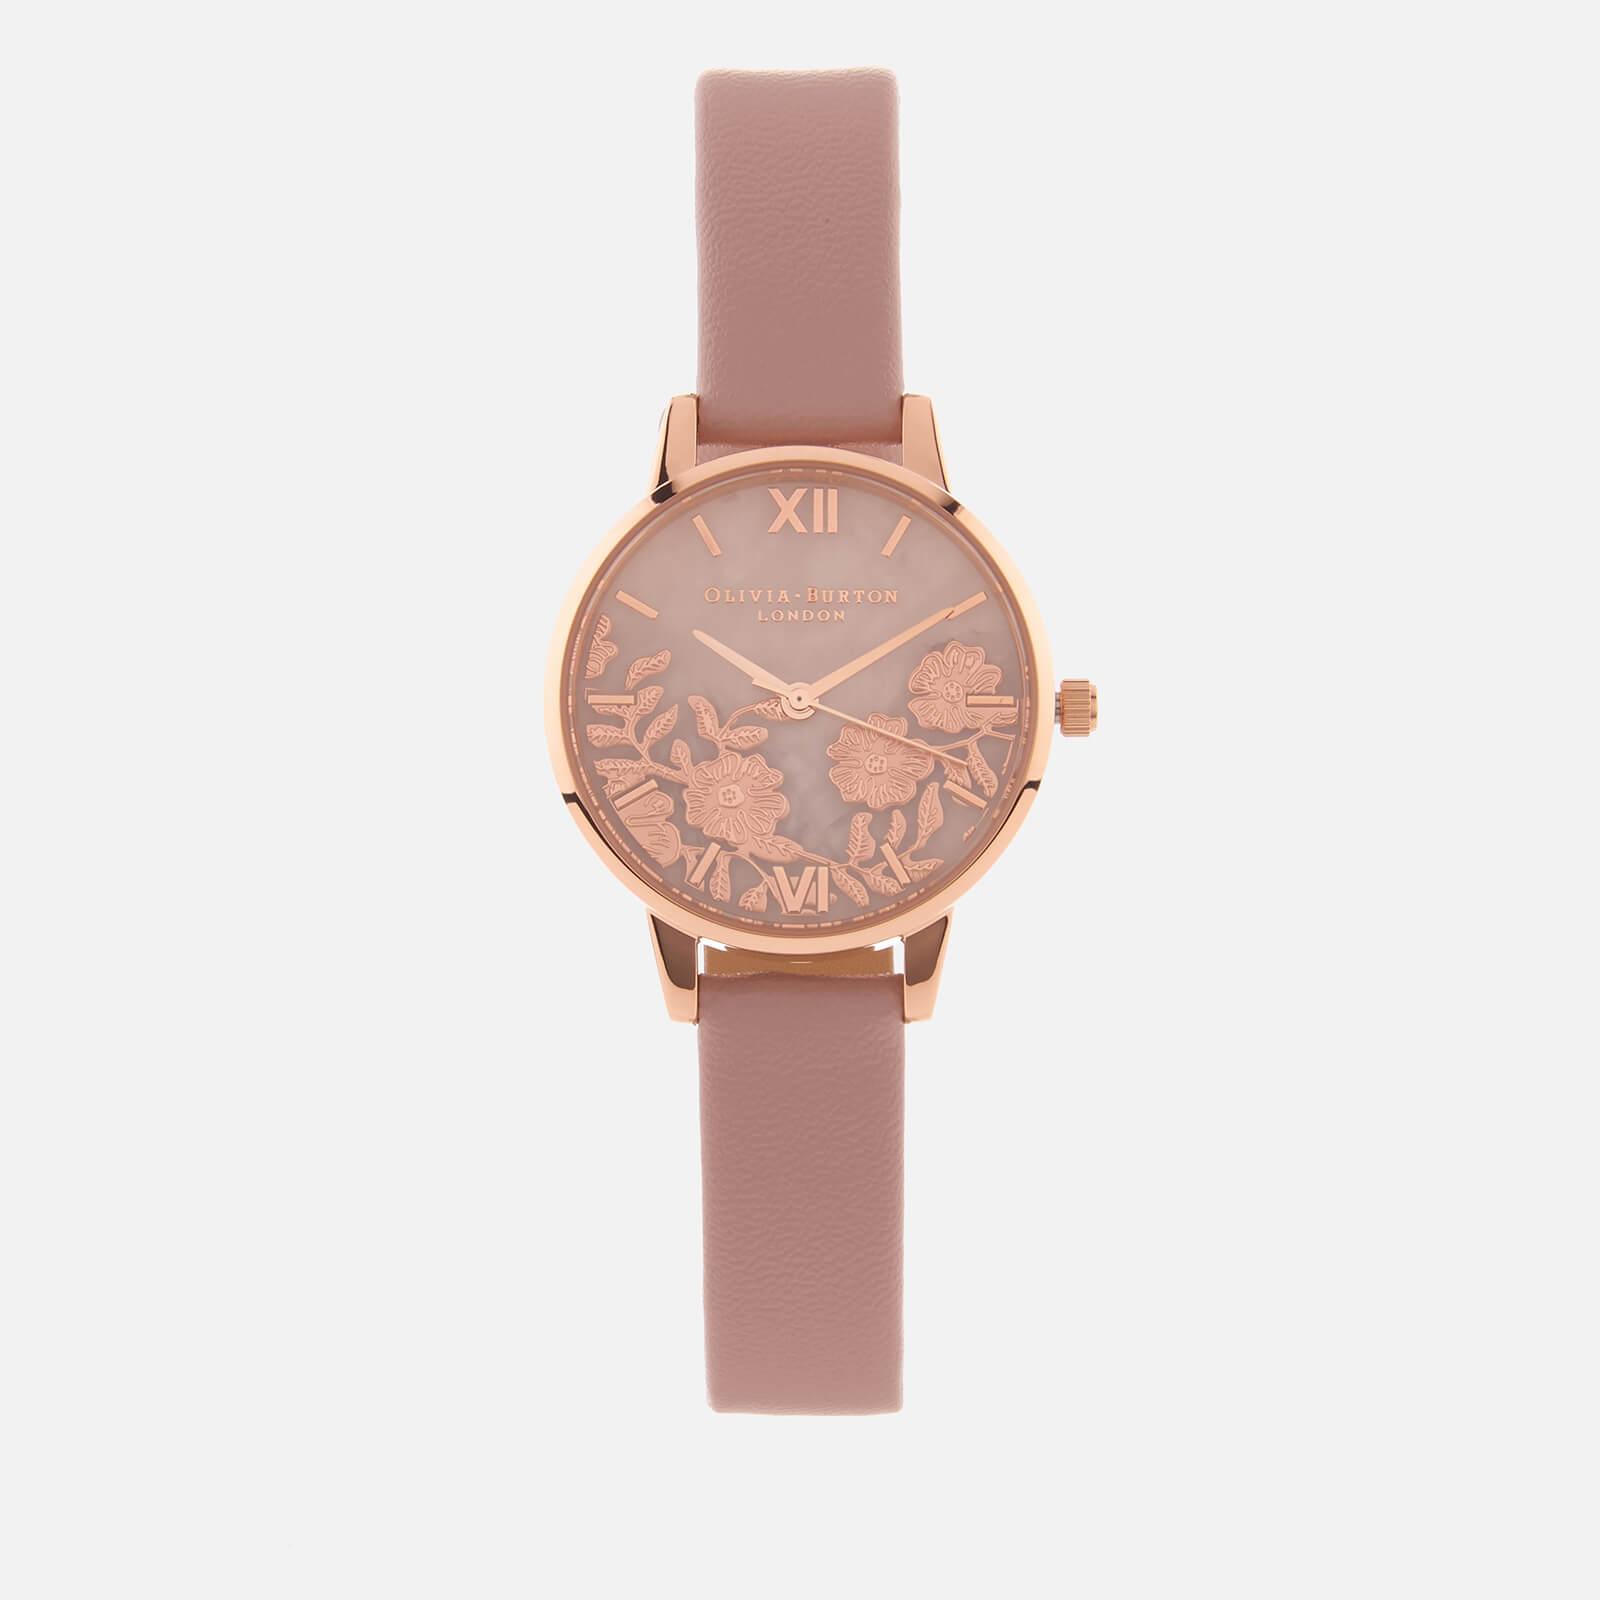 Olivia Burton Women's Semi Precious Watch - Pale Pink